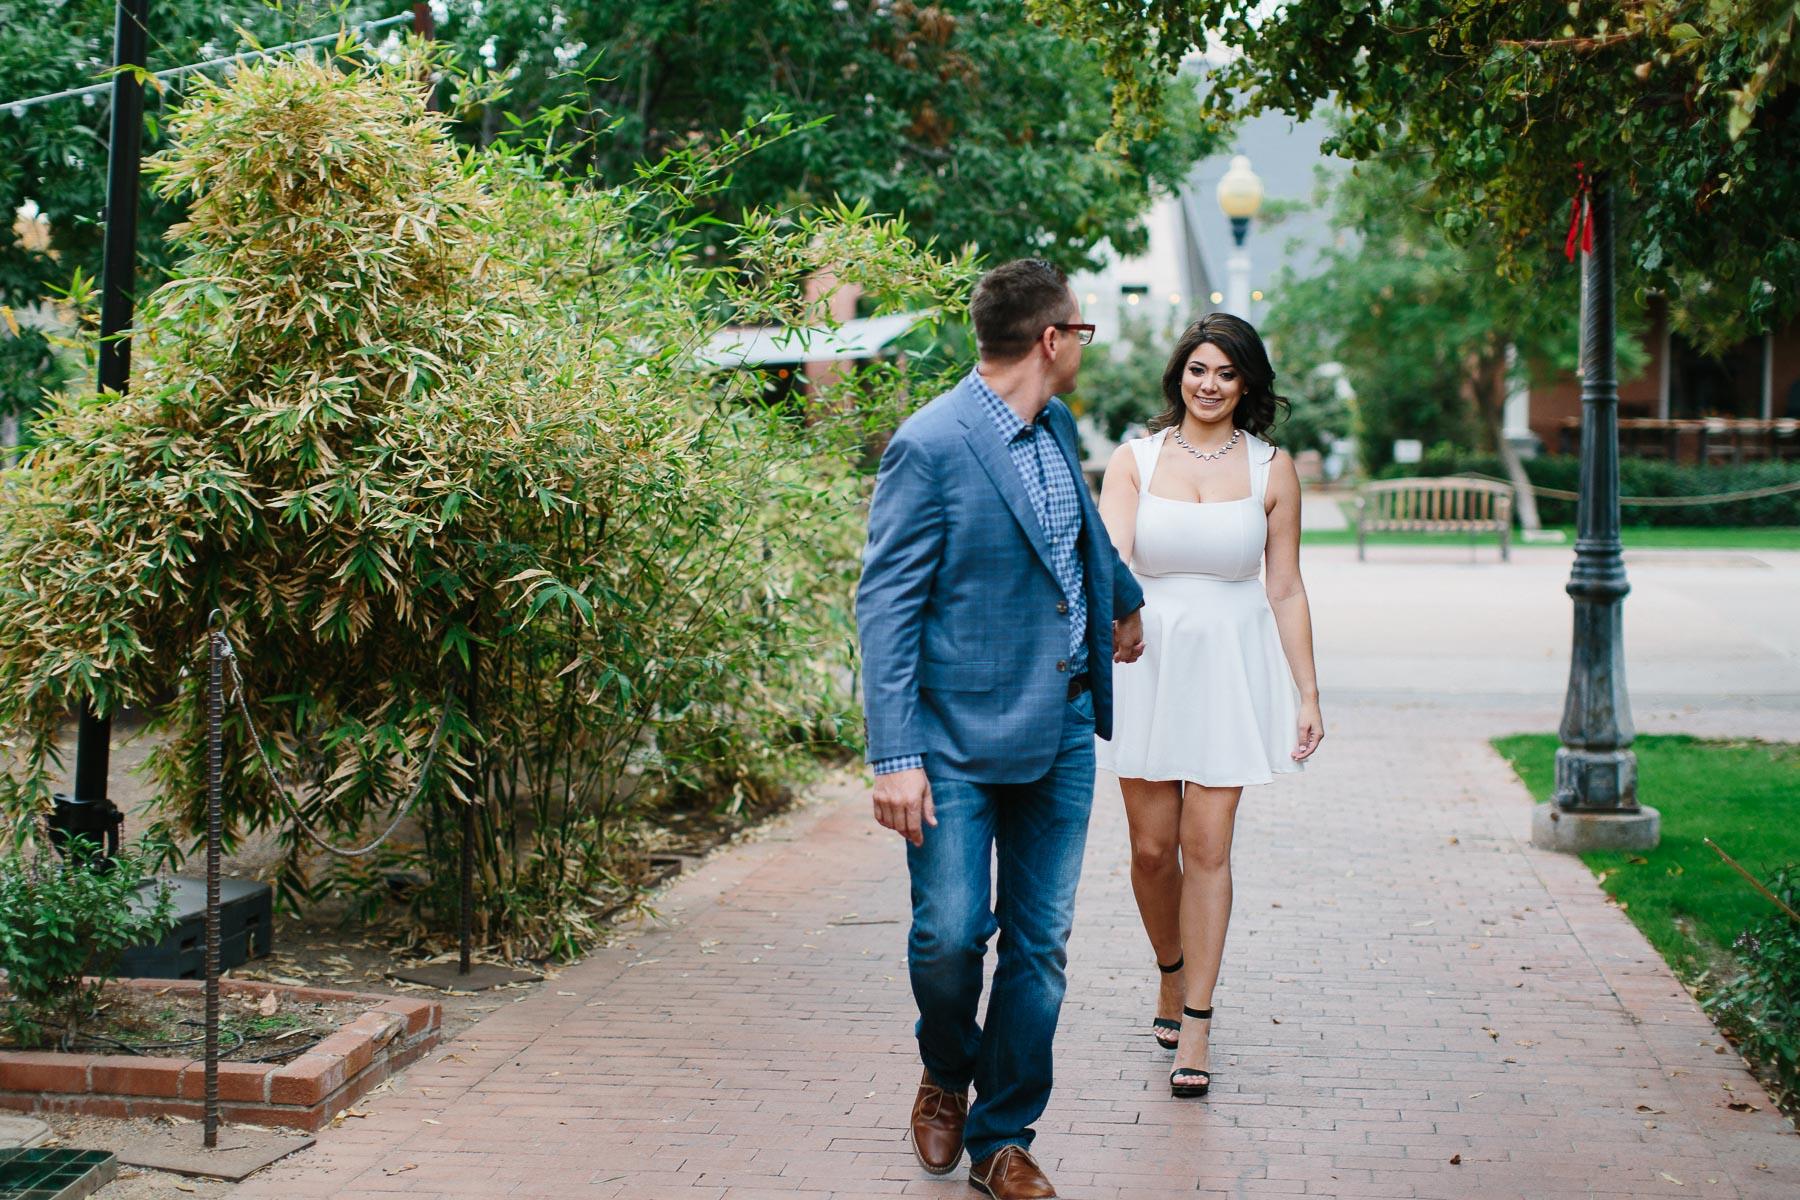 Luxium-Weddings-@matt__le-Engagement-Heritage-Square-Park-Downtown-Phoenix-Urban-Photography-102.jpg